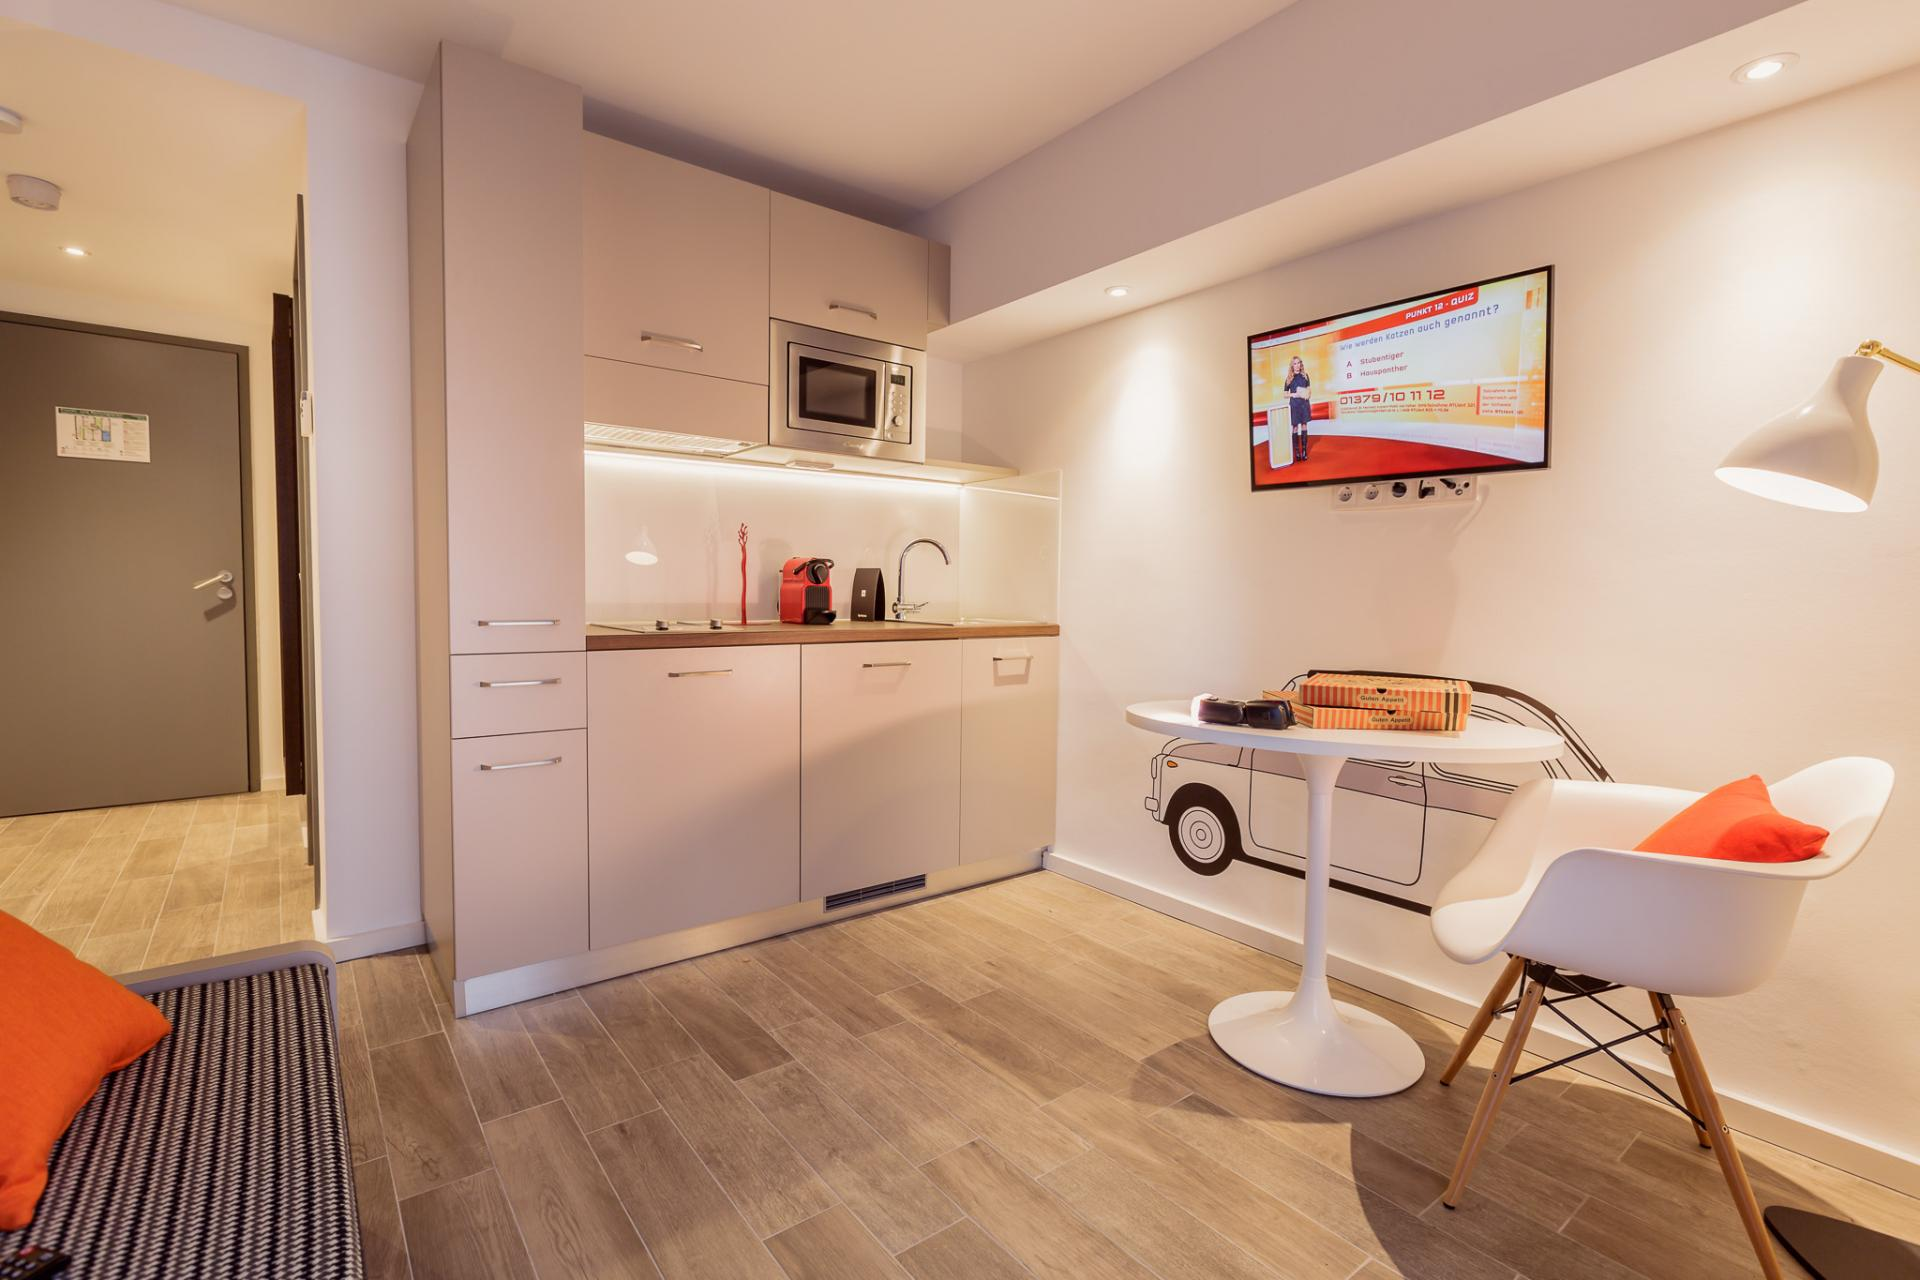 Kitchen at Brera Elbestrasse 29 - Citybase Apartments